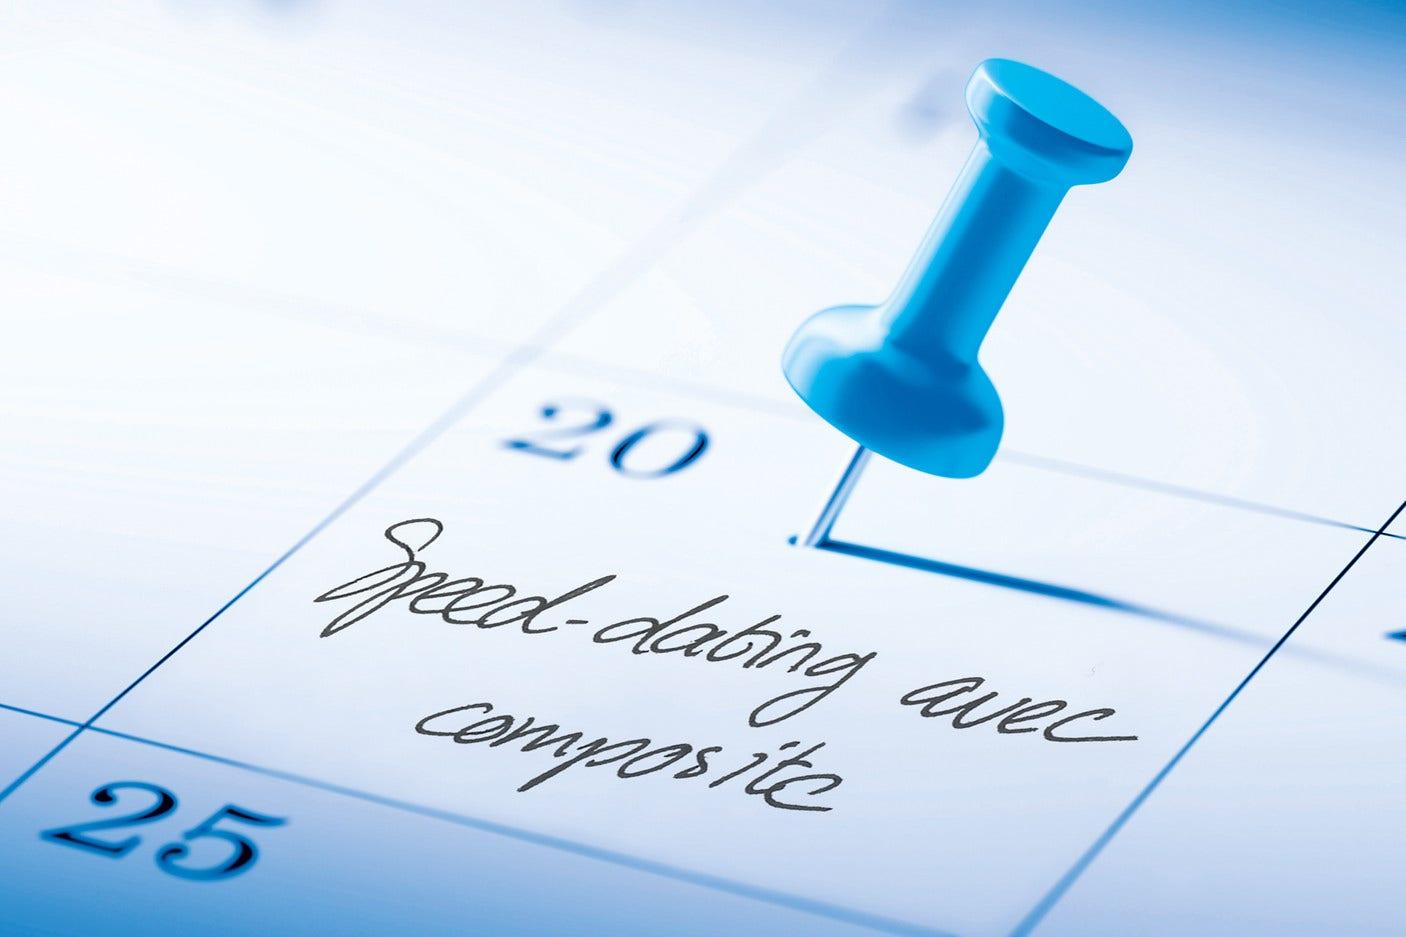 hastighet dating kalender